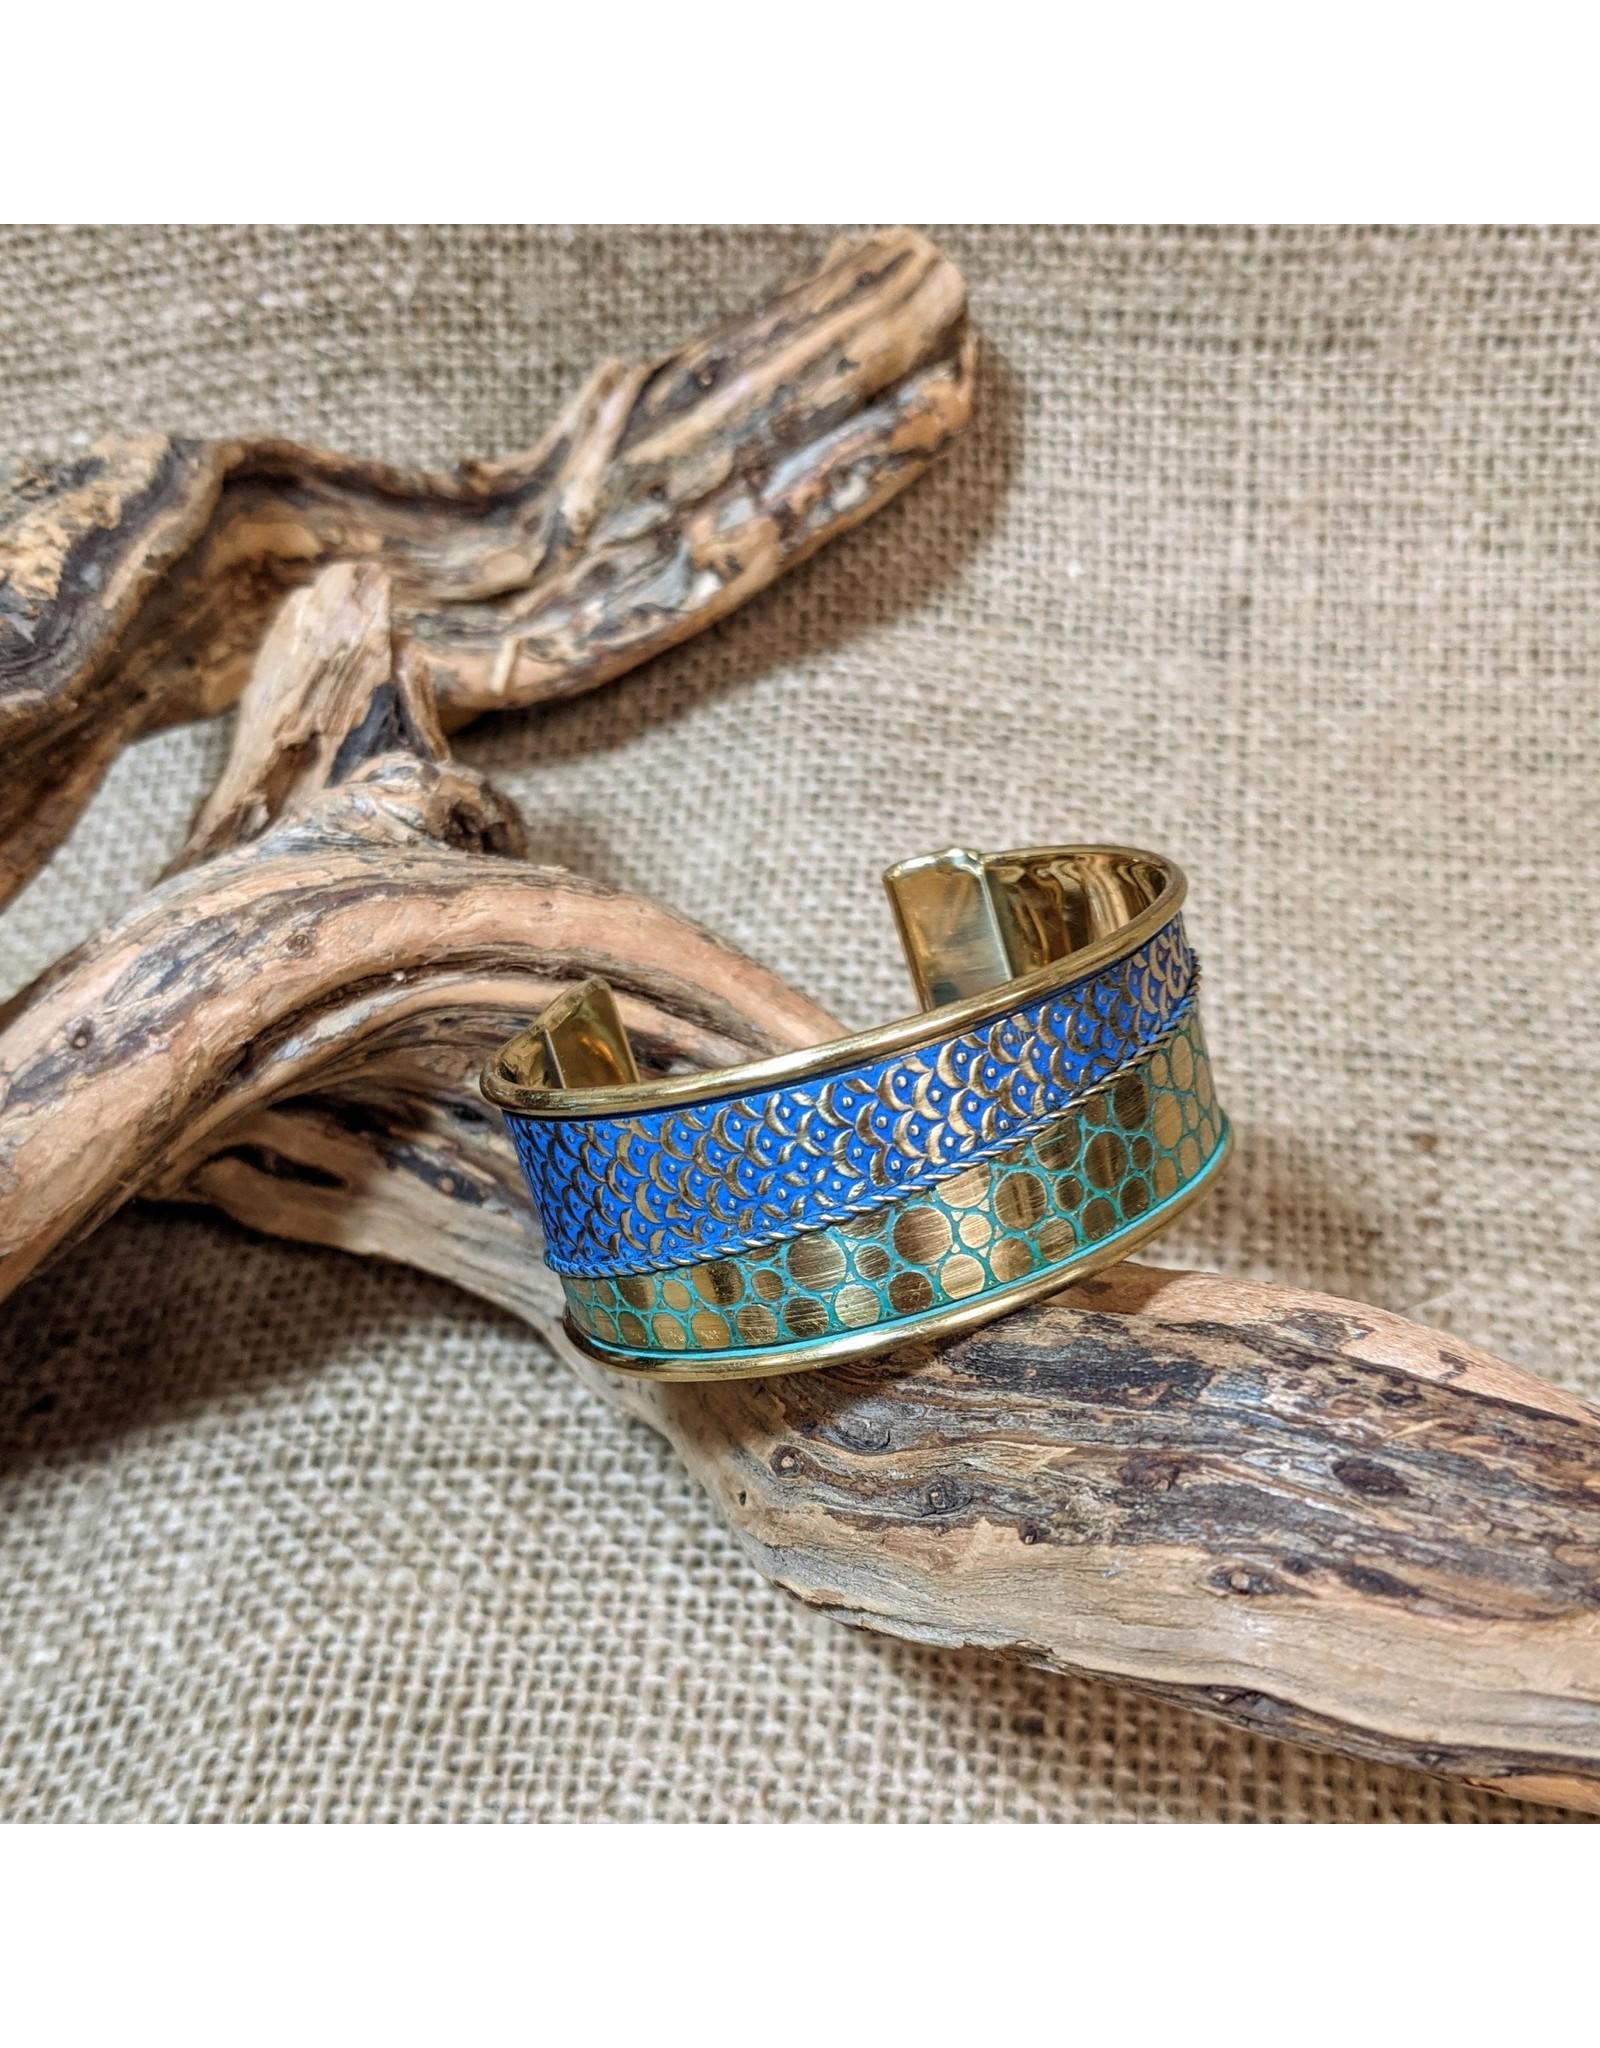 Ten Thousand Villages Turquoise Engraved Bracelet, India